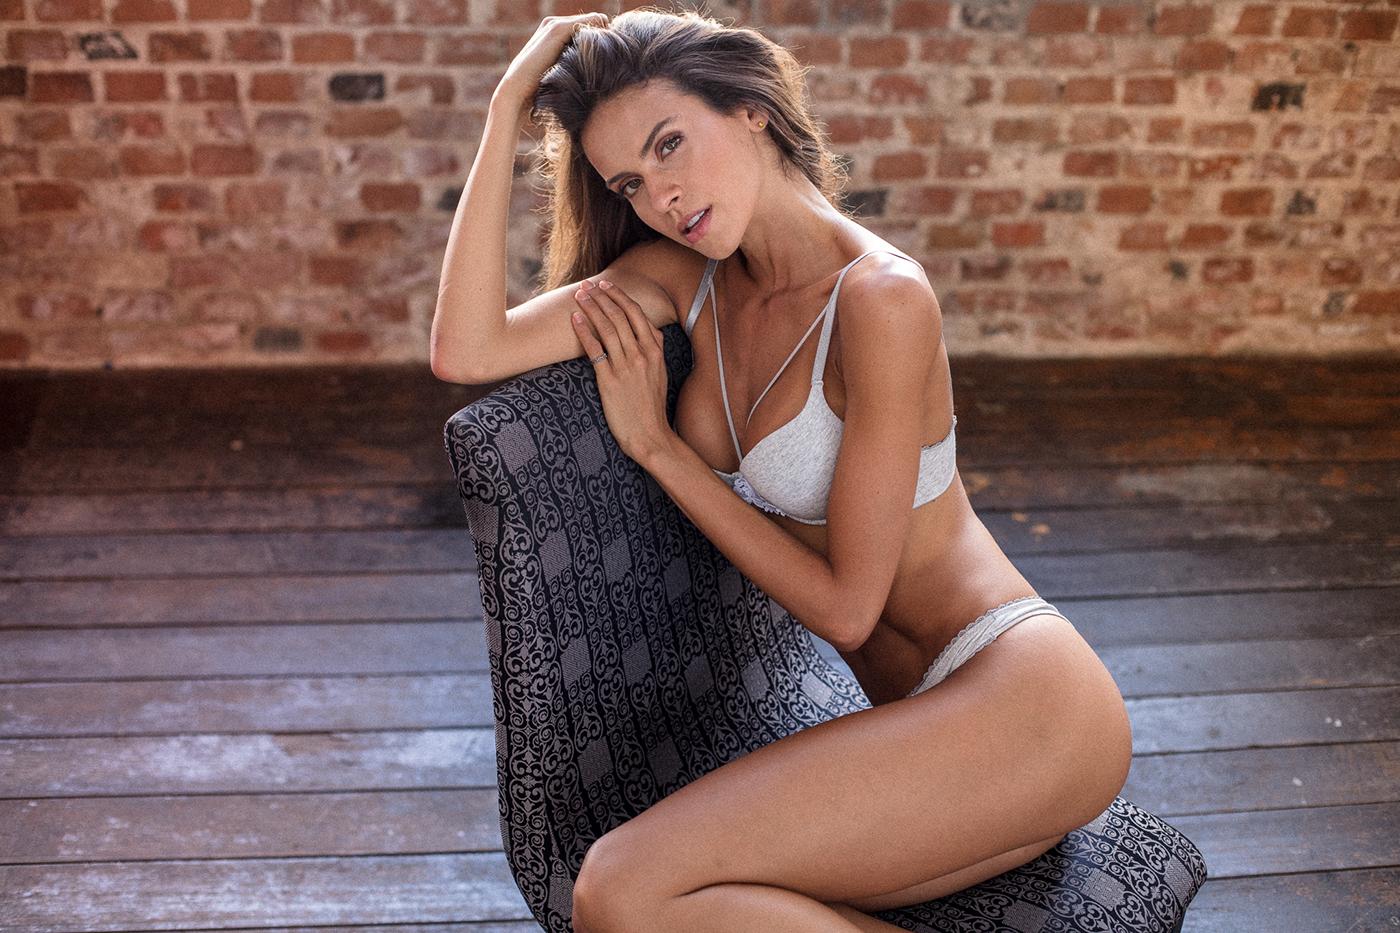 Marcella Peres Schauffert en lingerie